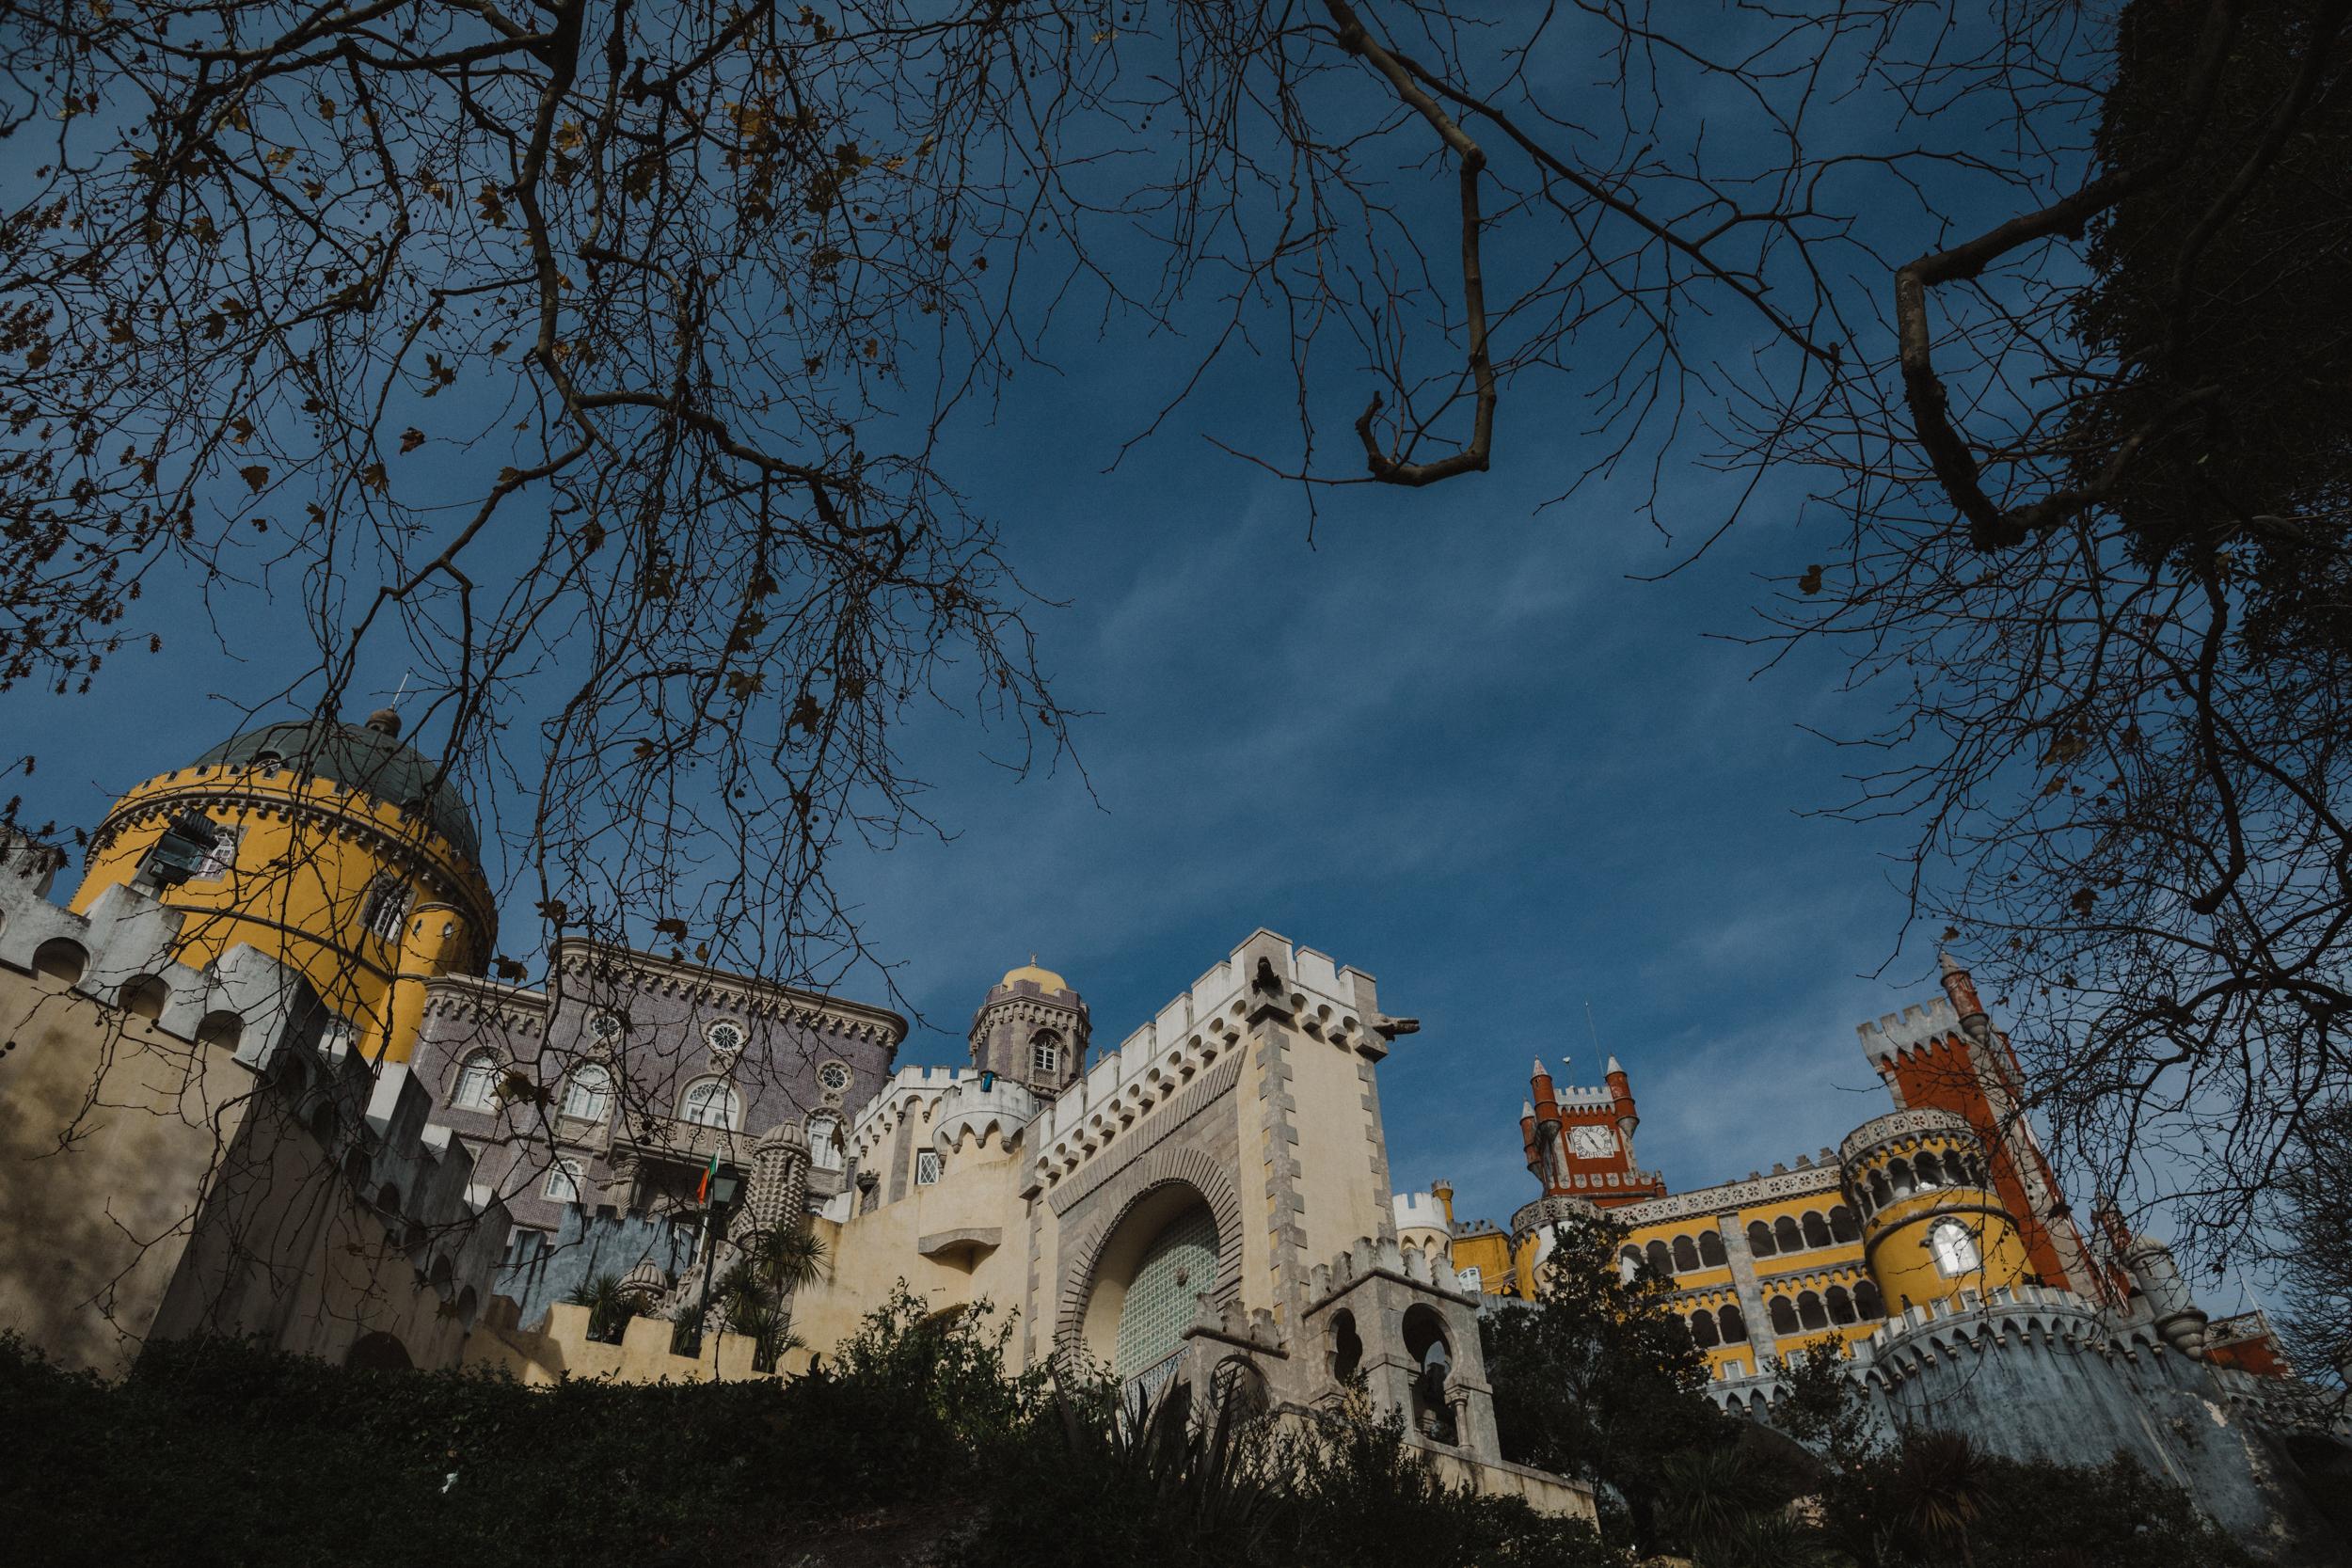 The beautiful Palace de Pena